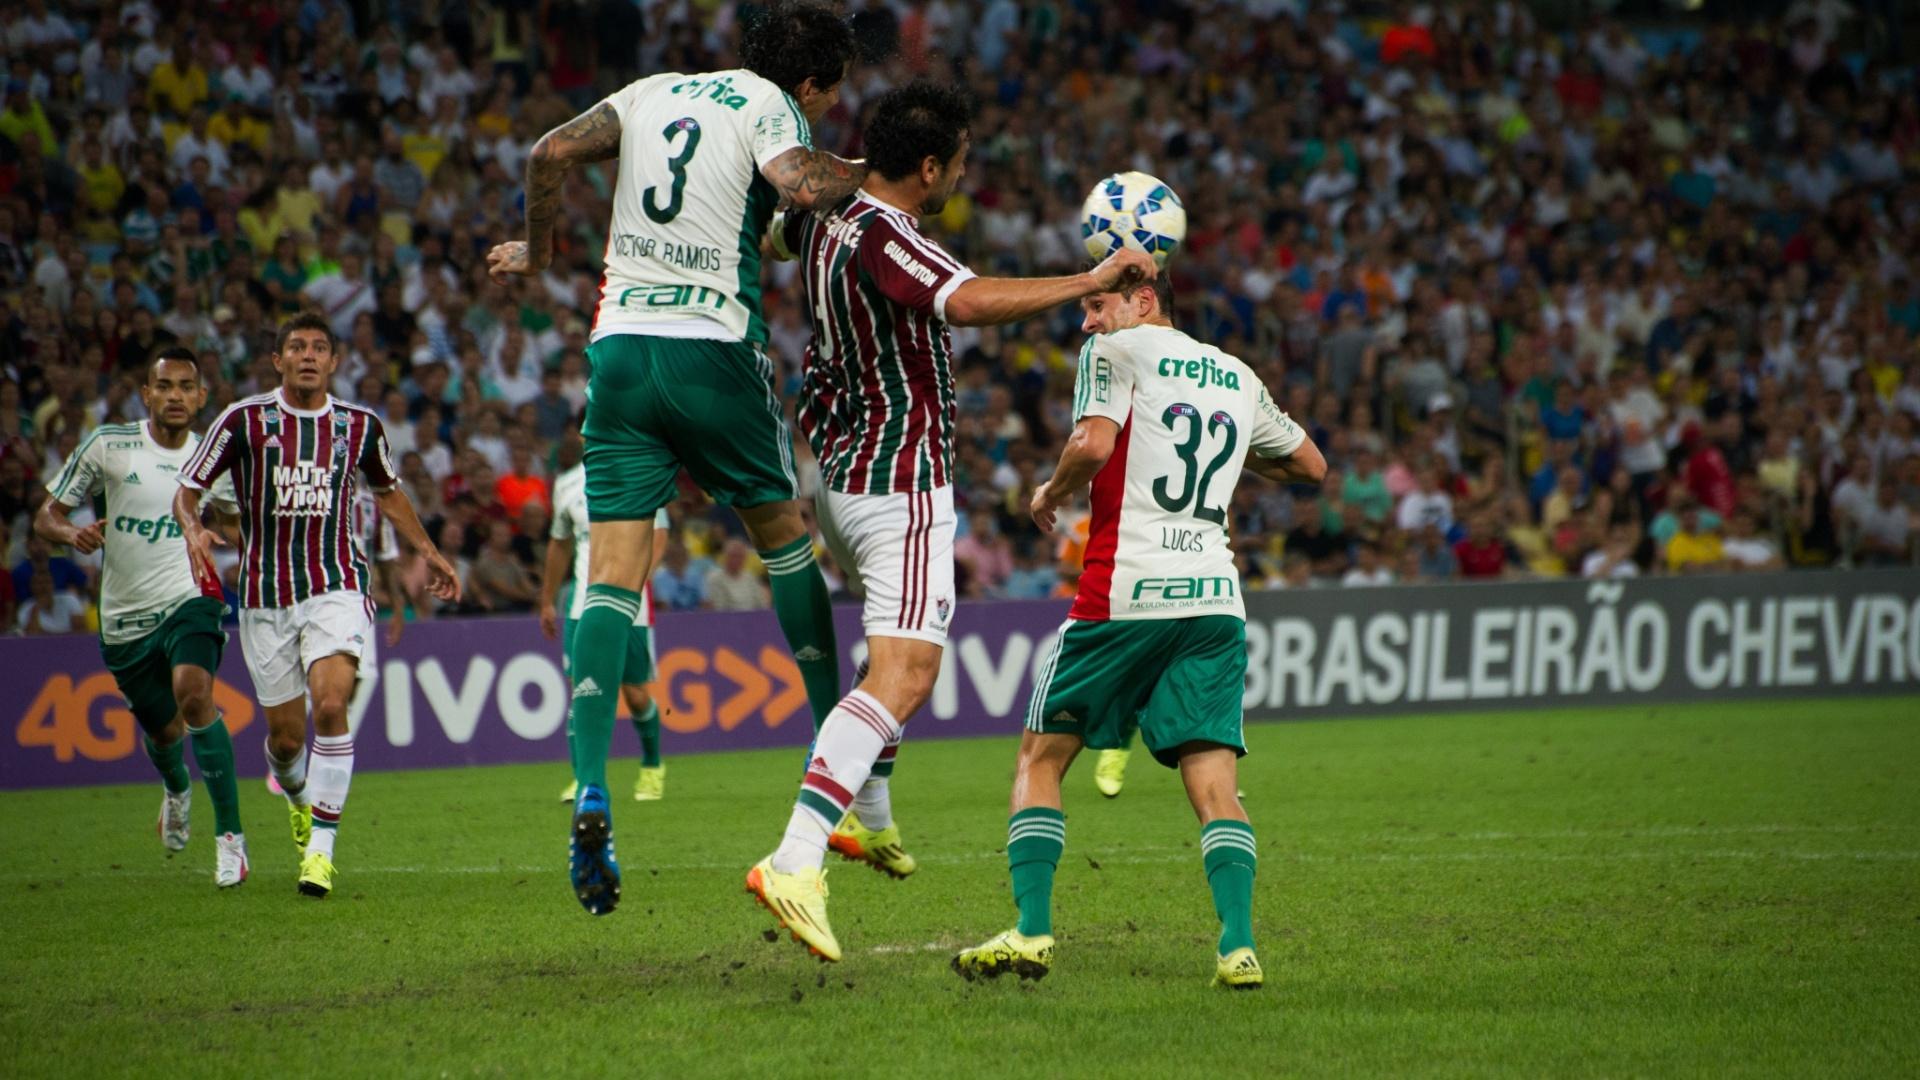 Fred e Victor Ramos disputam bola no confronto entre Fluminense e Palmeiras, válido pela 26ª rodada do Campeonato Brasileiro